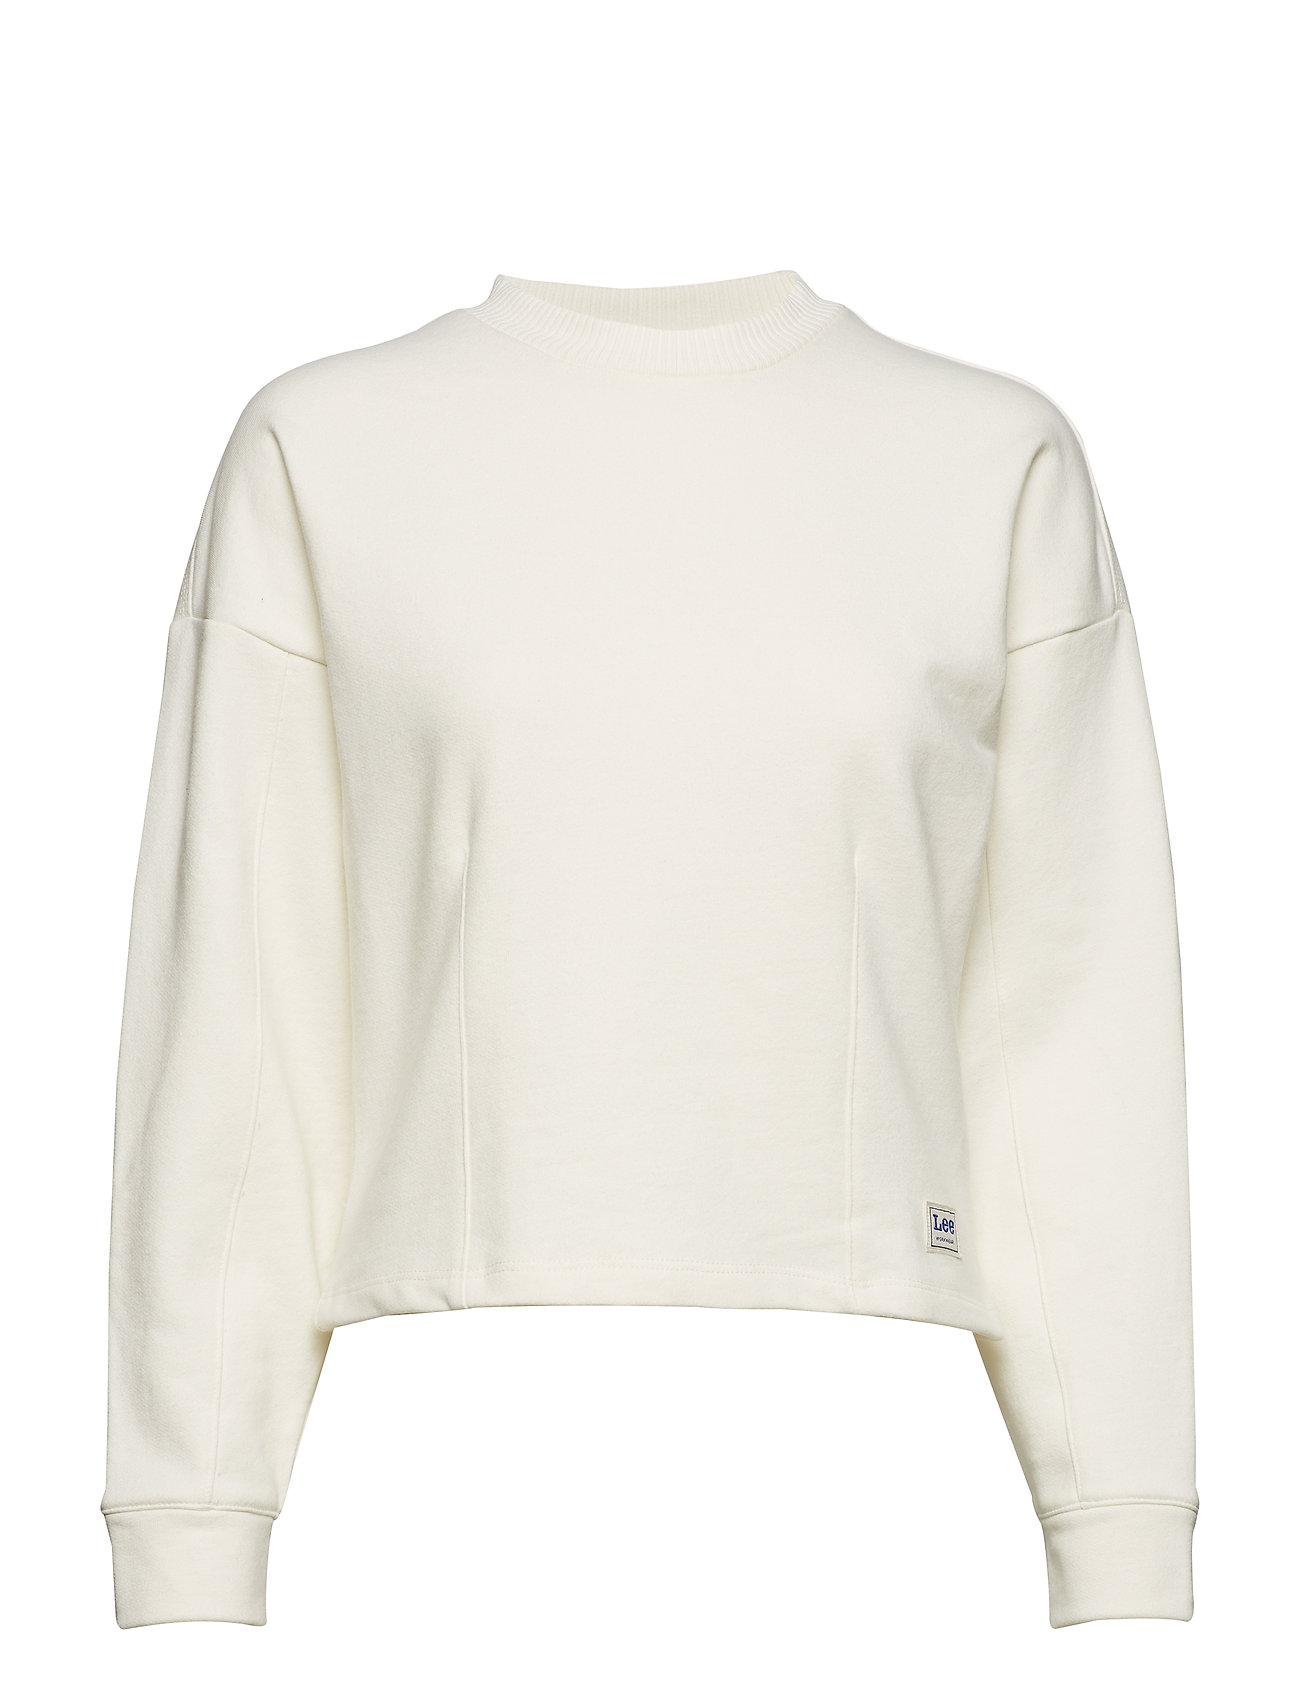 Lee Jeans Volume sweatshirt - VANILLA ICE